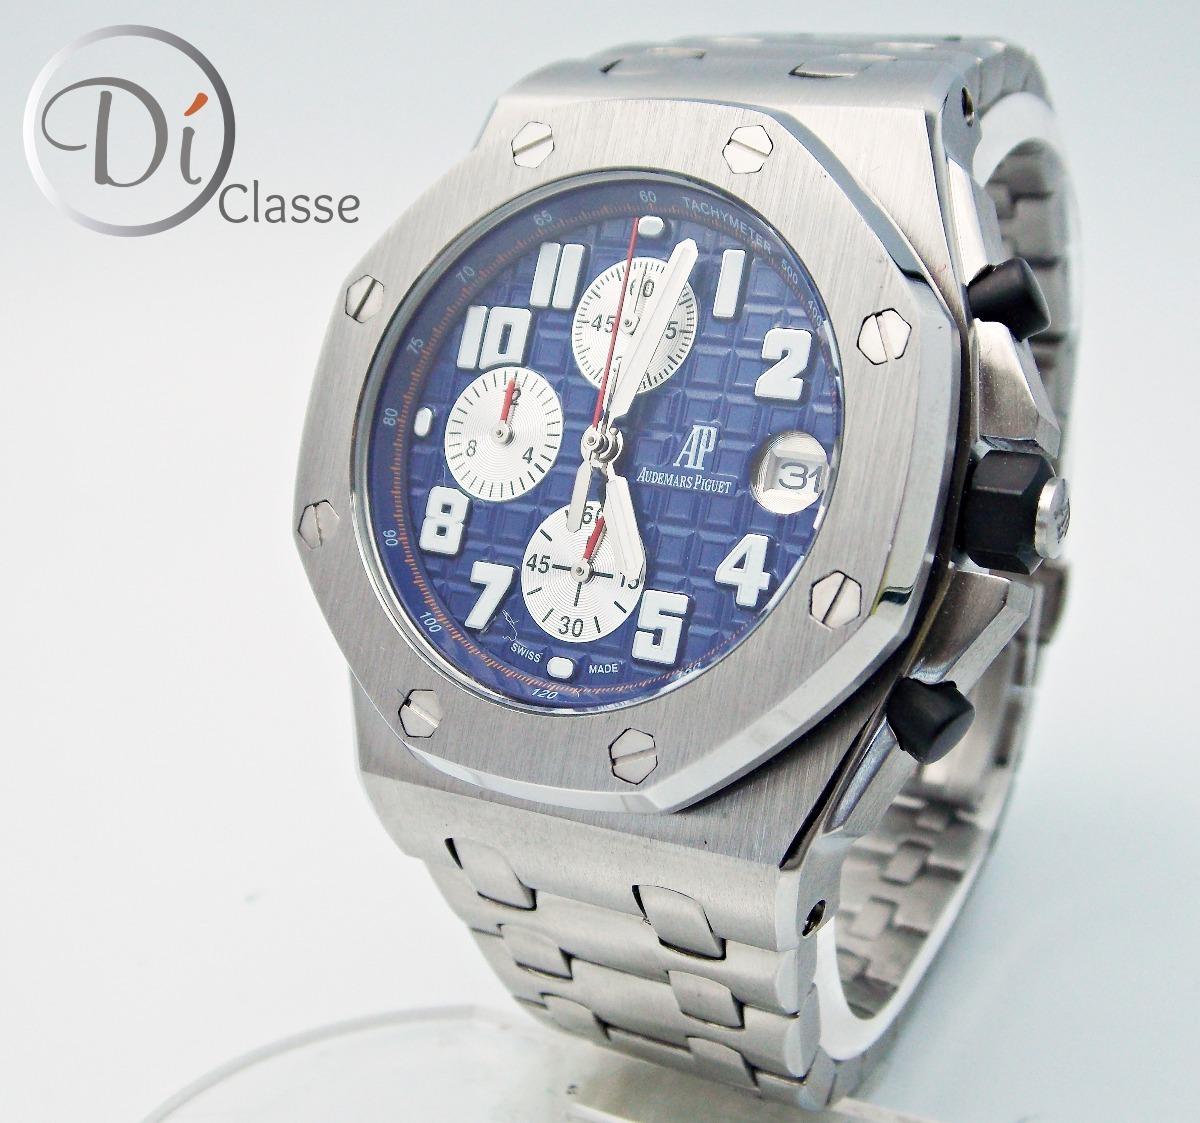 cdd68ab9387 Reloj Audemars Piguet Royal Oak Offshore Acero   Azul -   4